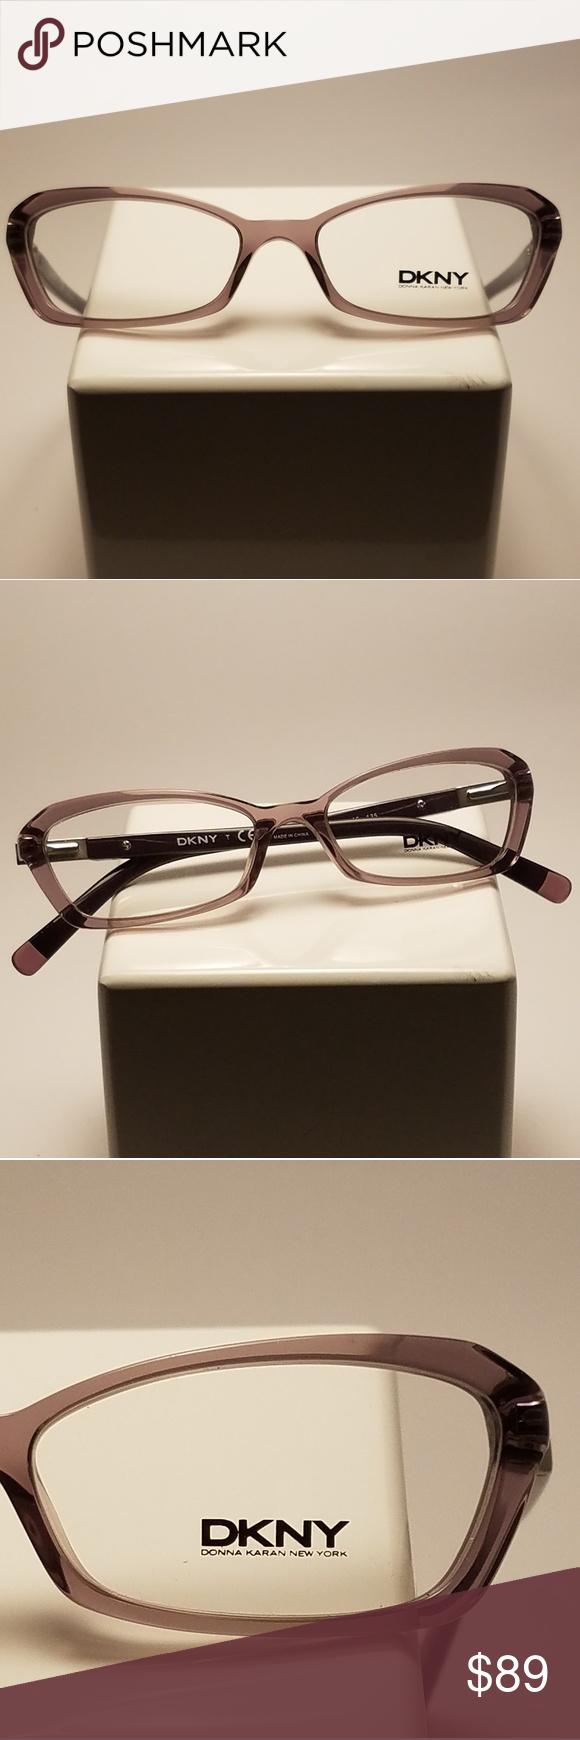 17f2110143c5 DONNA KARAN NY Women s Eyewear Authentic DKNY Women s Eyewear. Never Worn.  Size 51